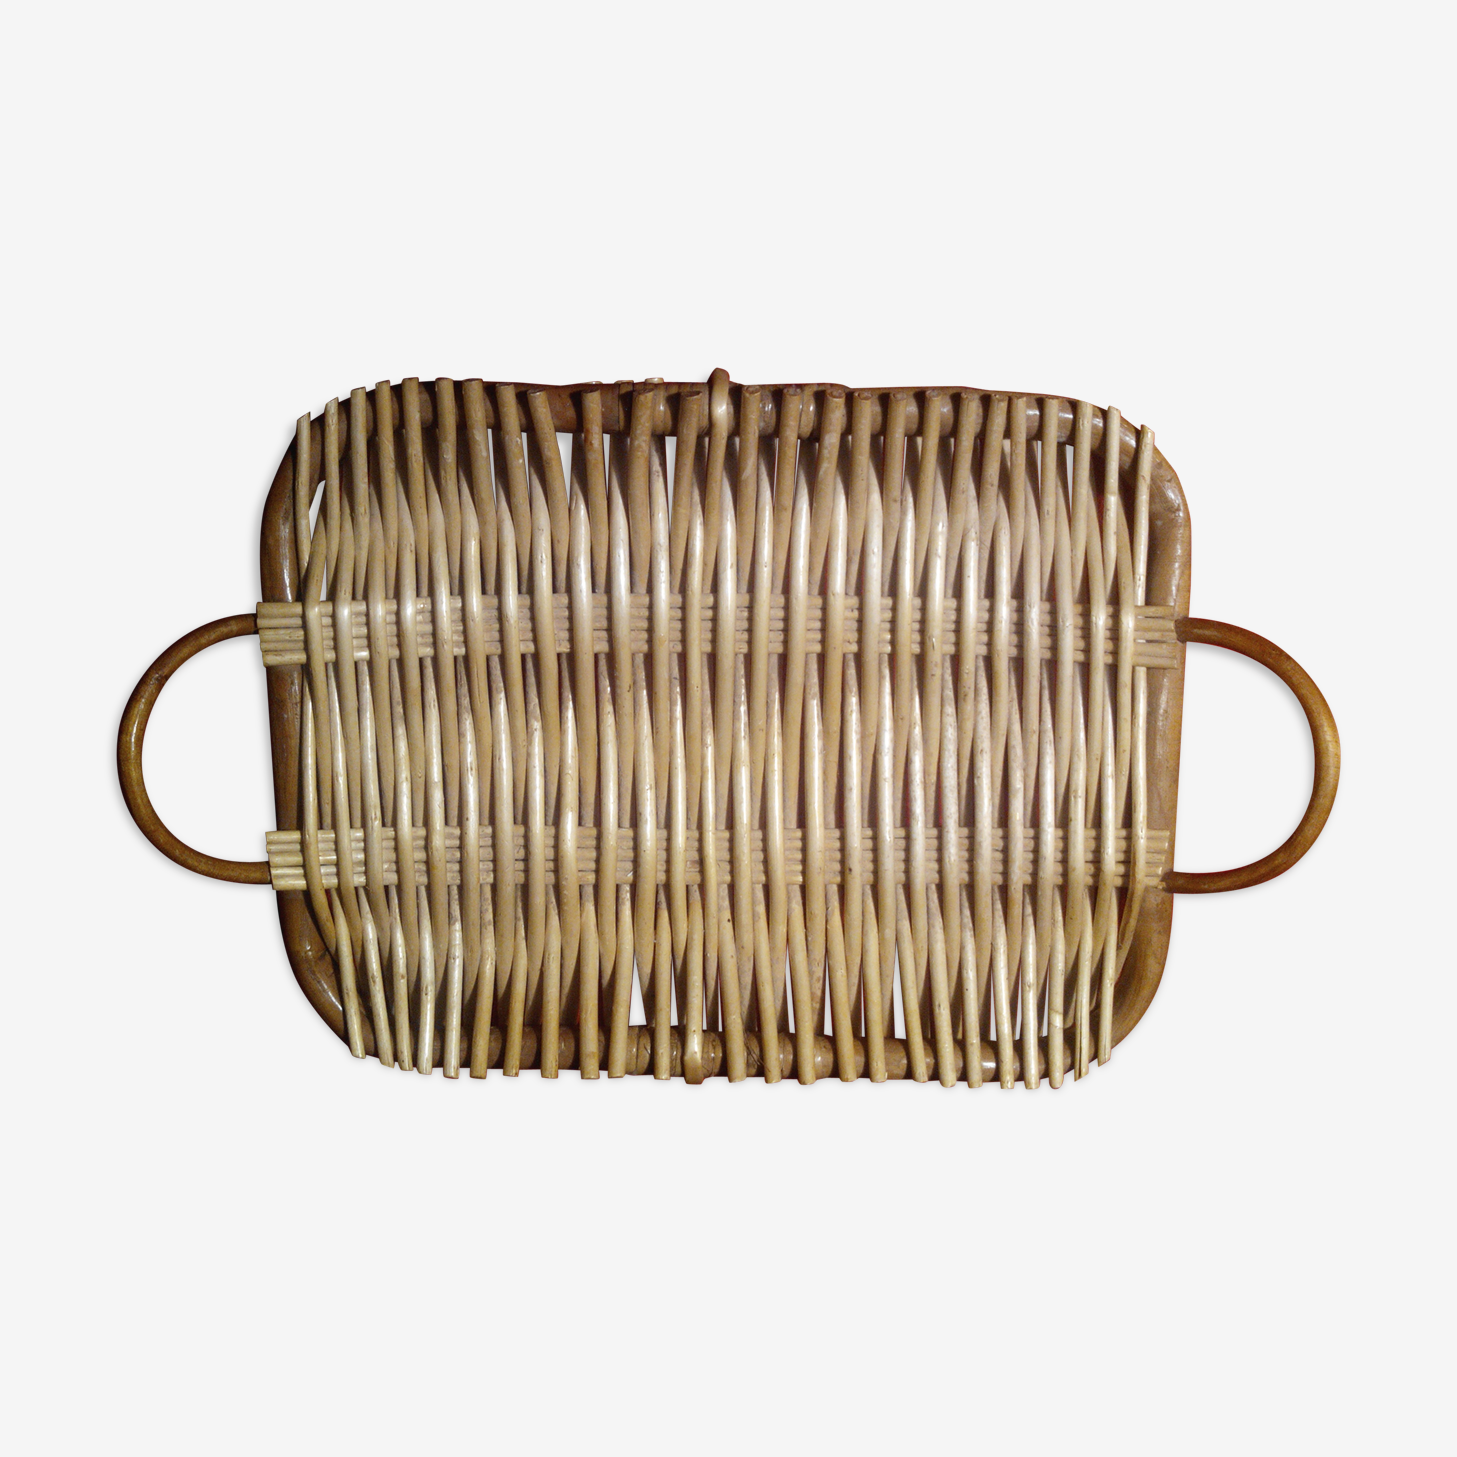 Plateau bambou rotin